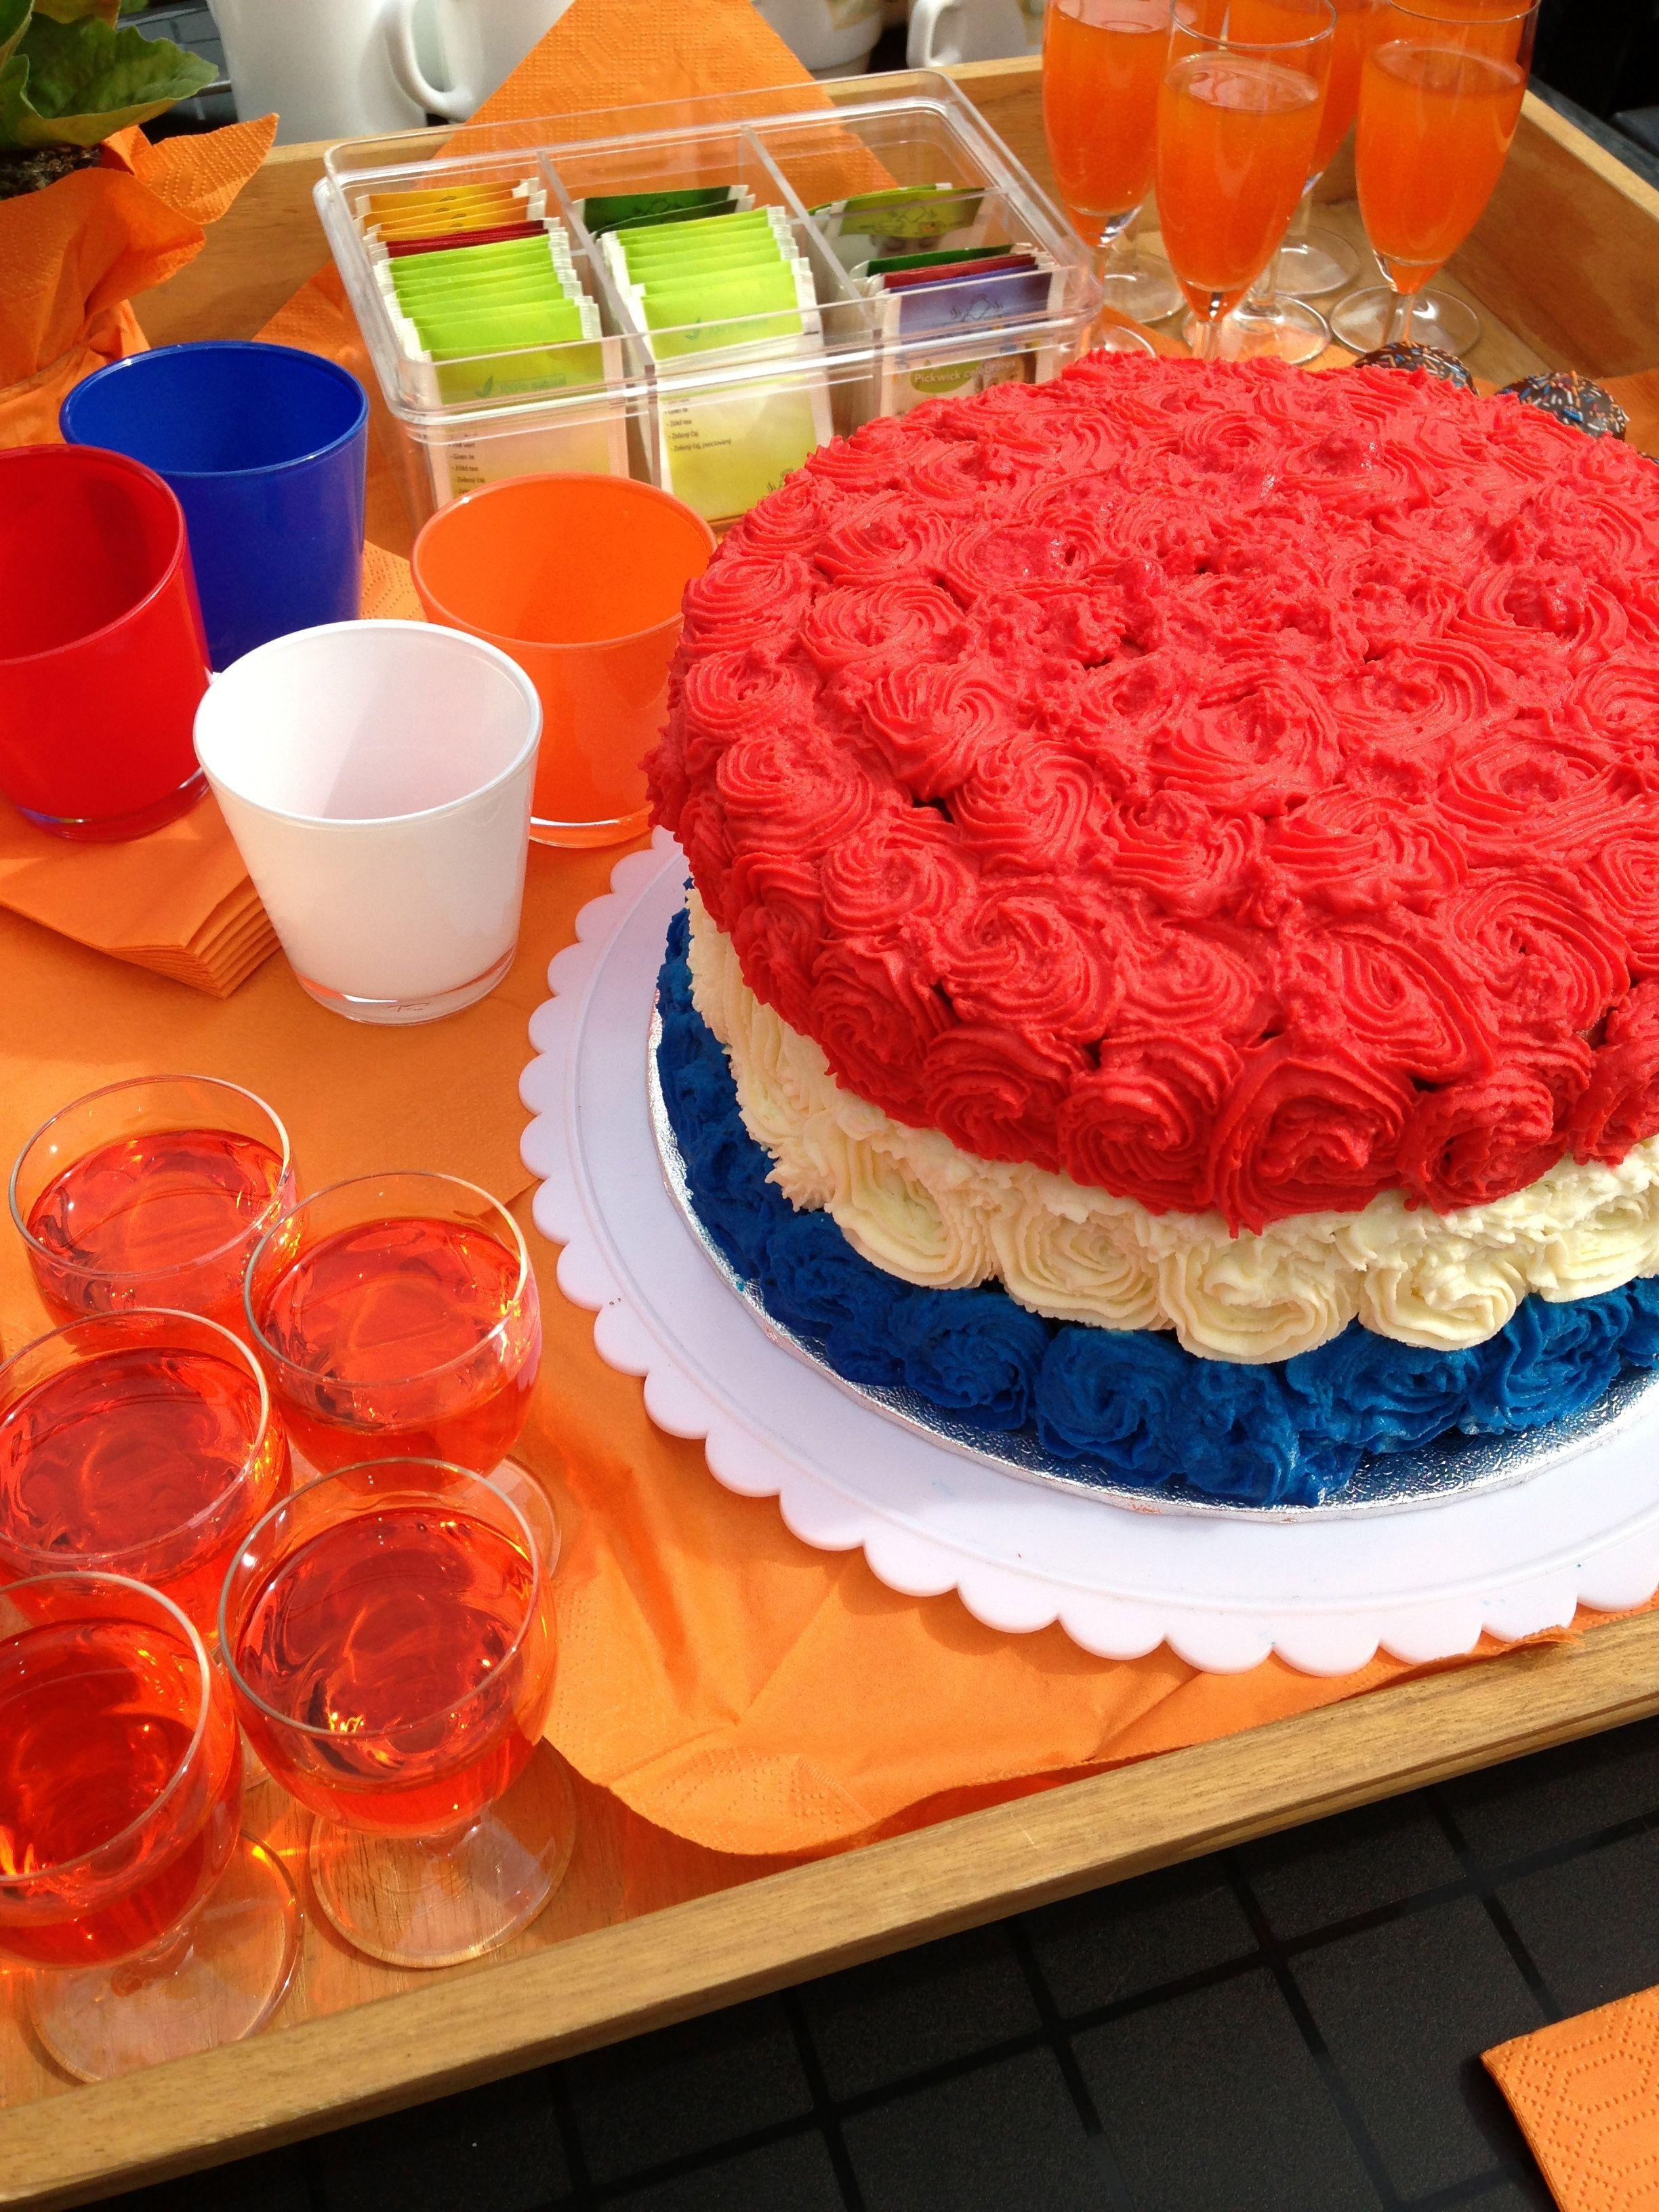 koning taart Koning Taart! | Taart KrisenZo! | Pinterest   Taart en Inspiratie koning taart